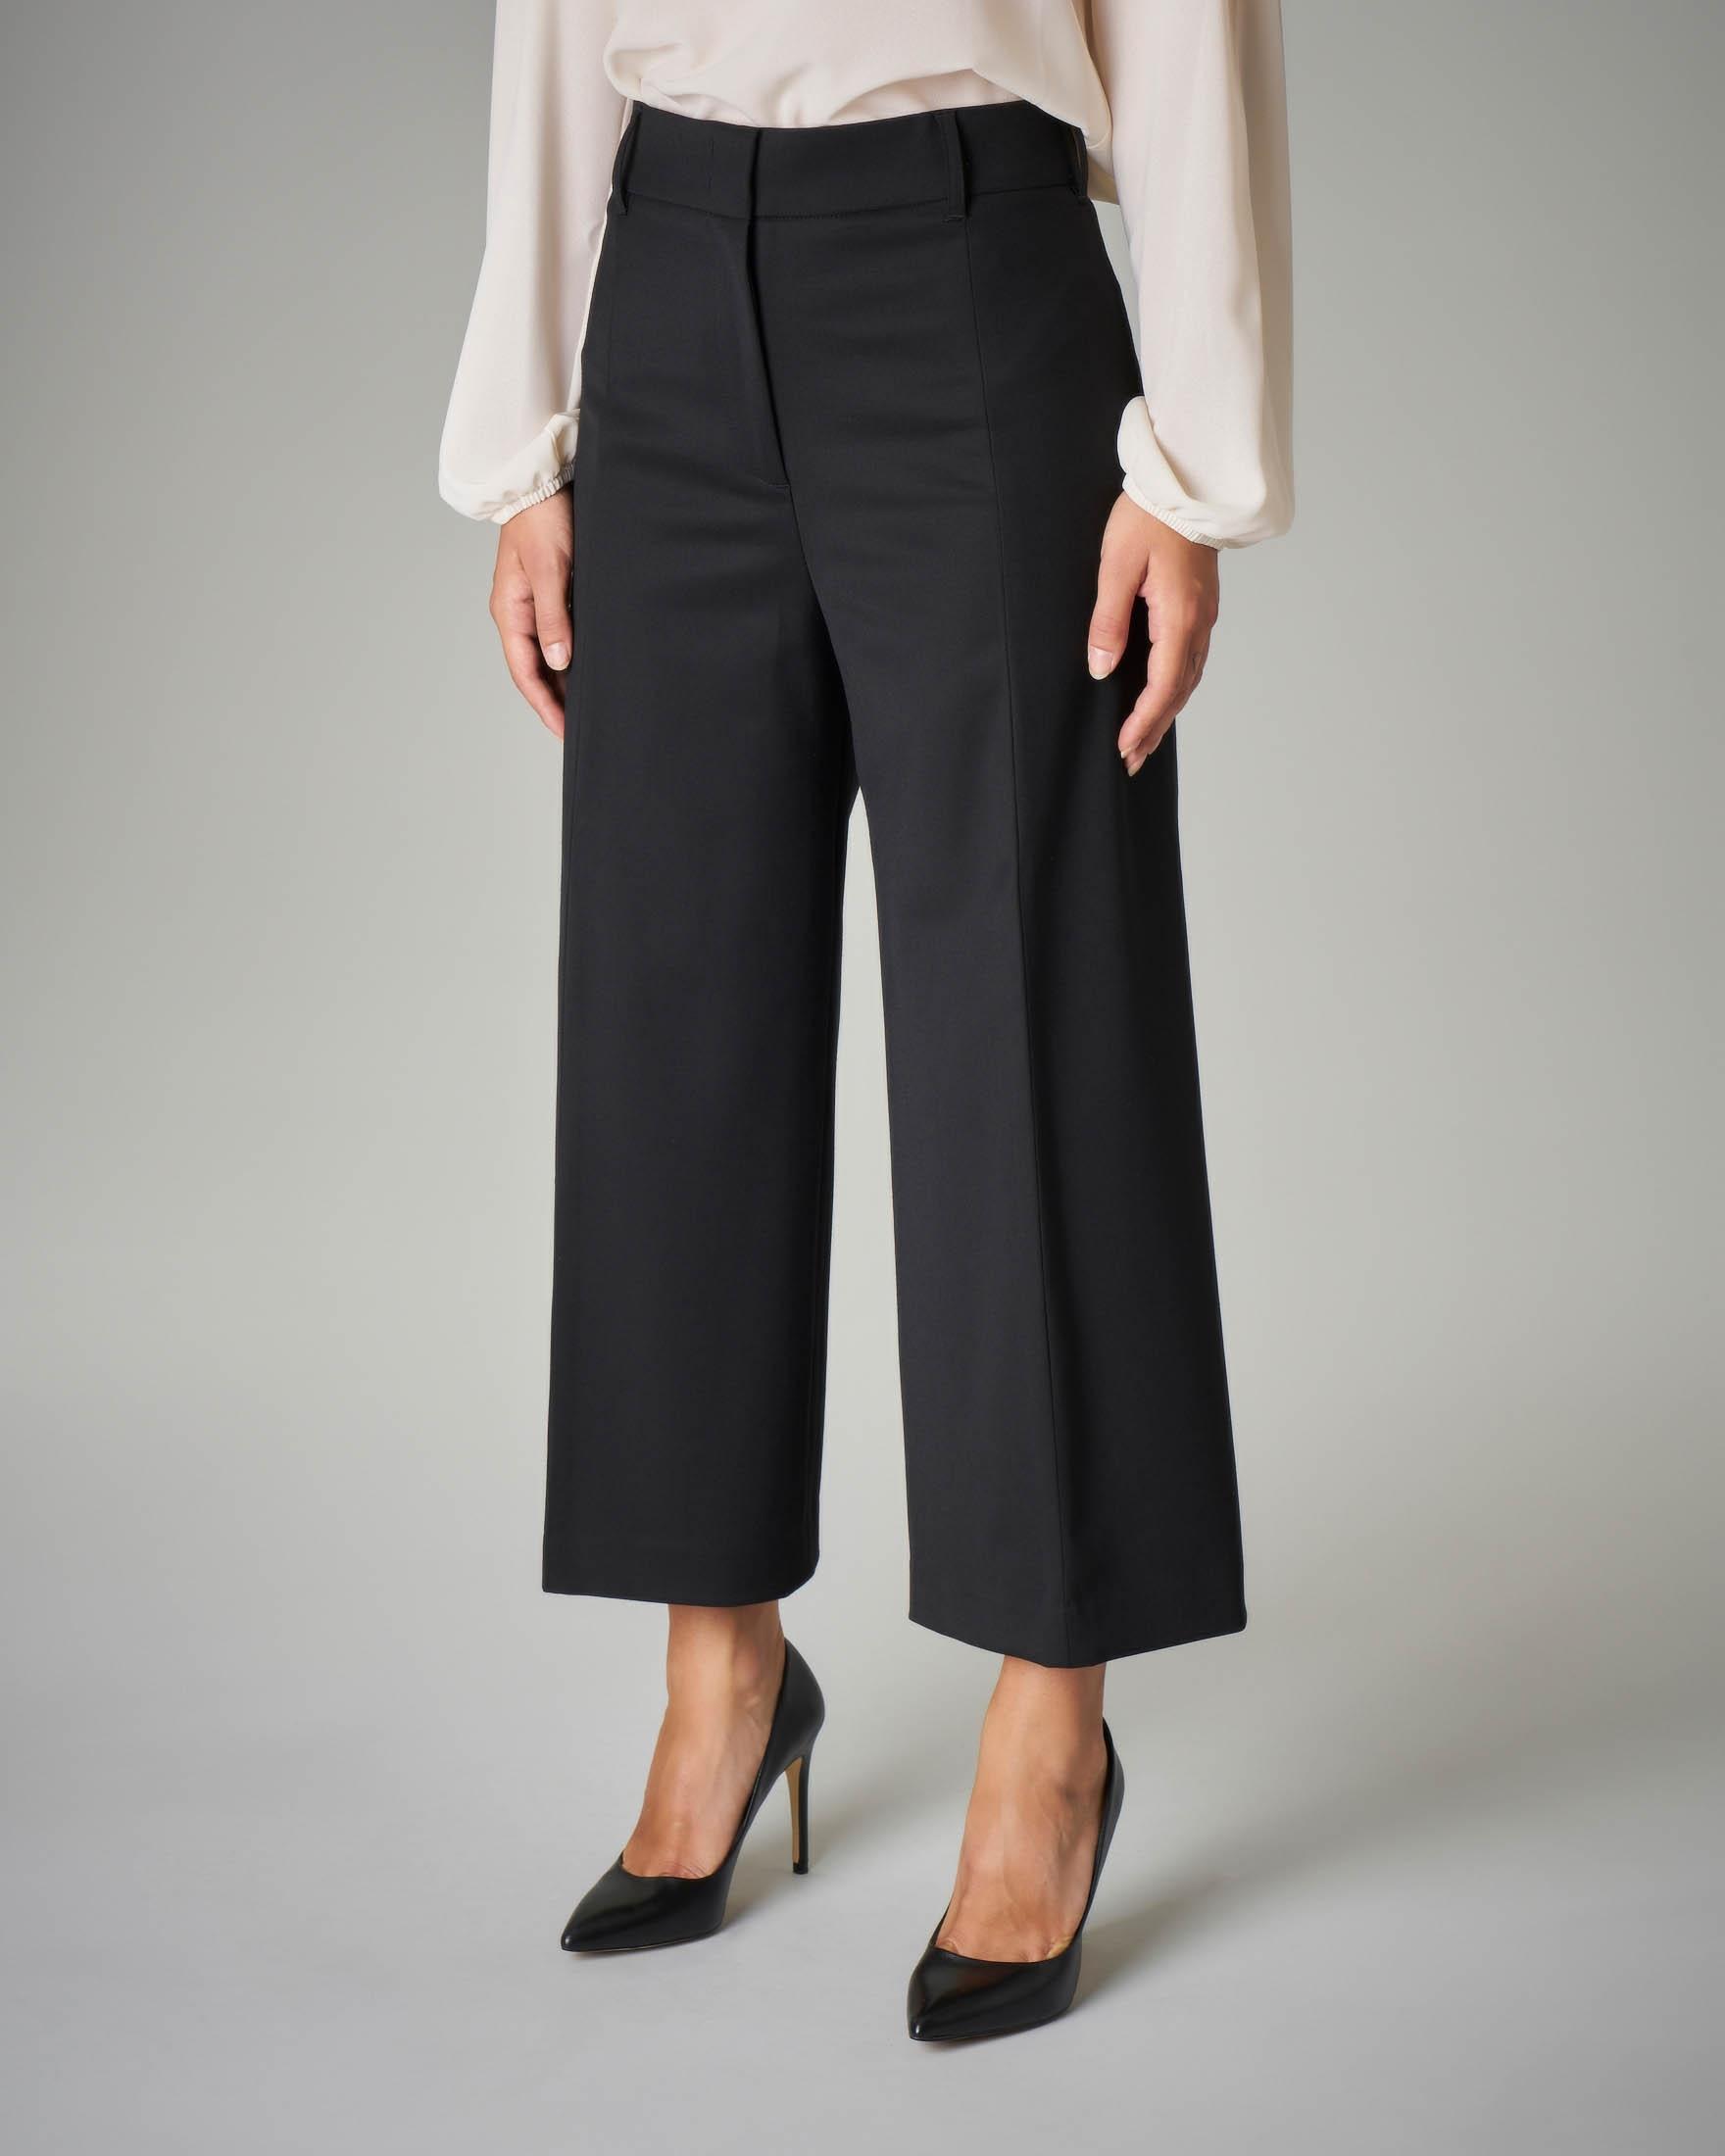 Pantalone palazzo nero crop in fresco di lana